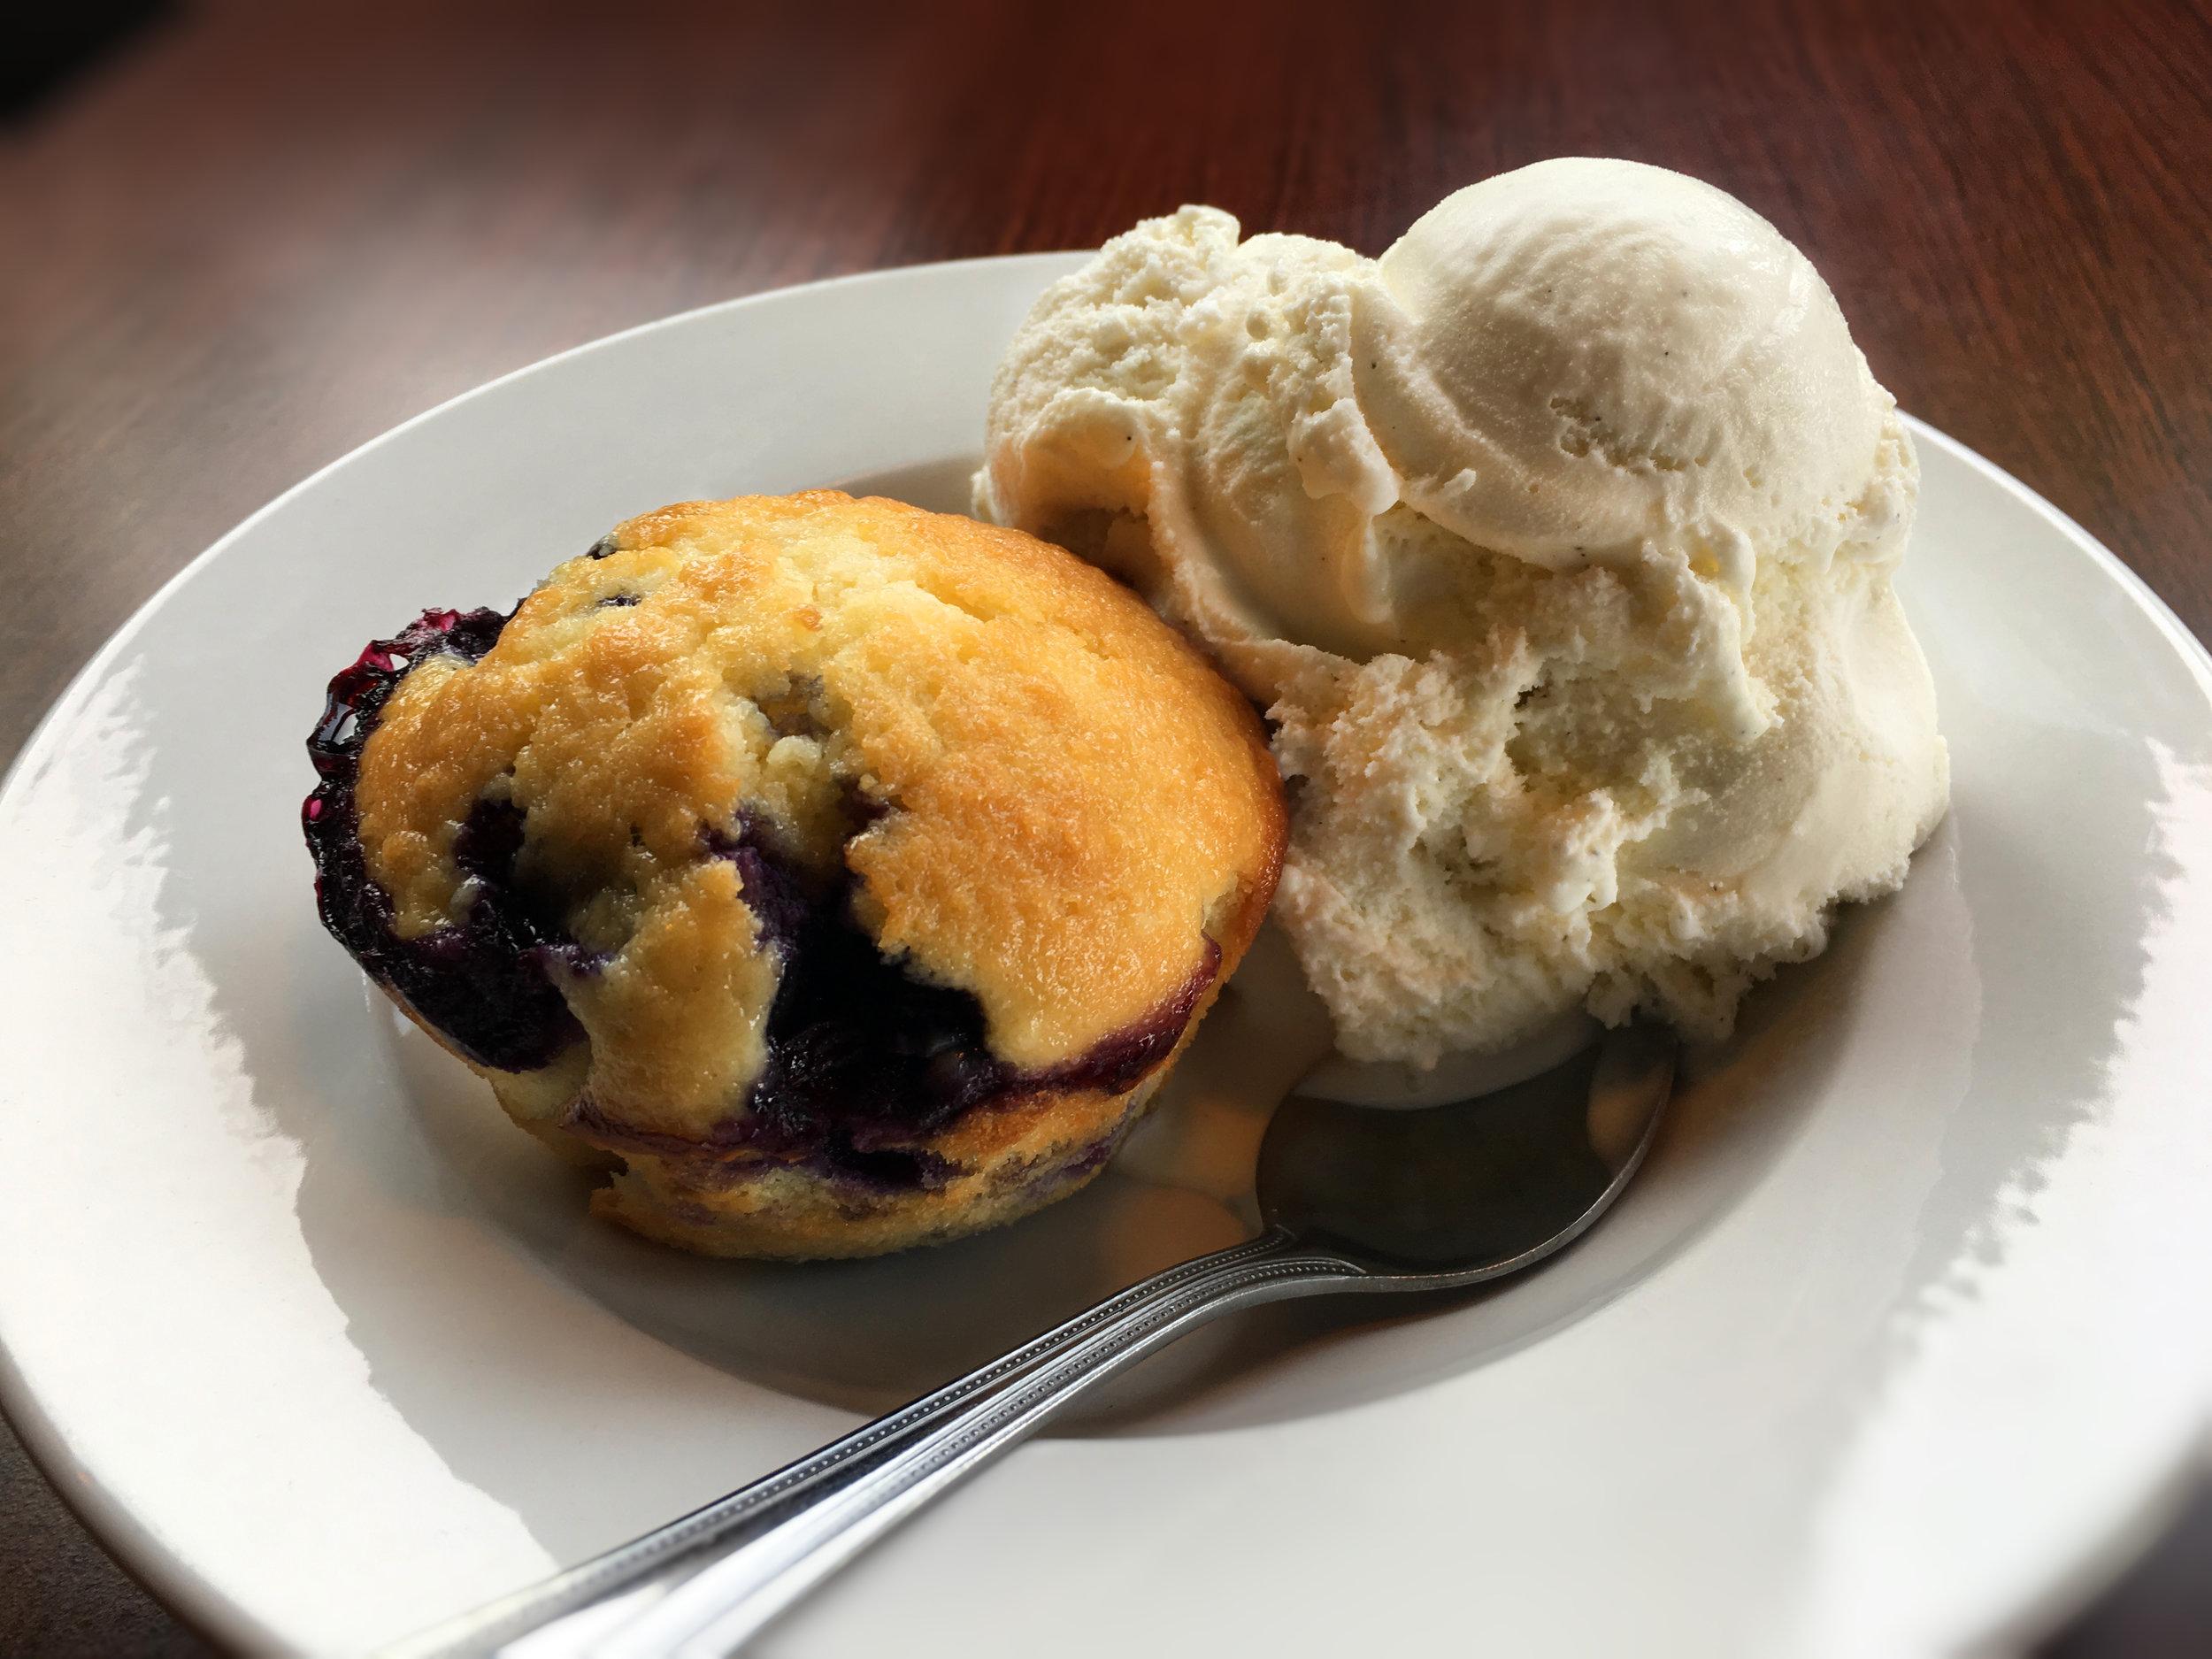 Blueberry Muffin with Ice Cream Dessert